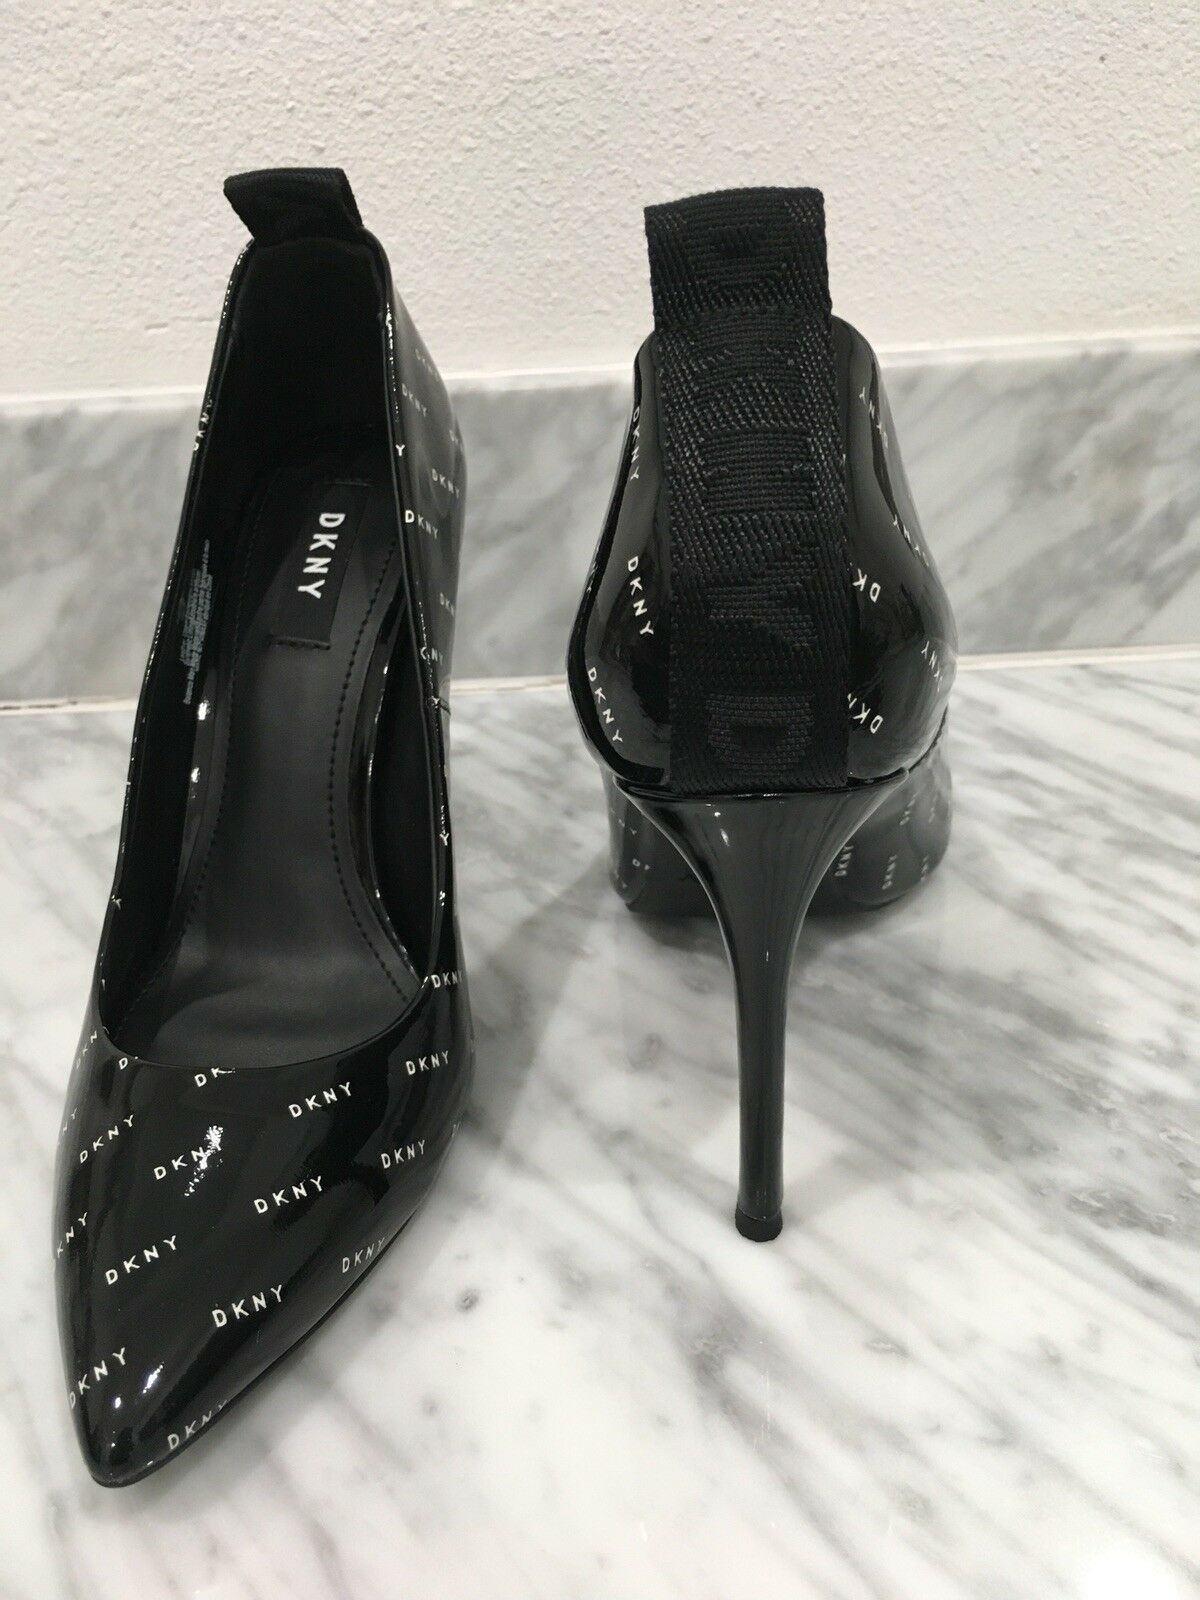 New DKNY DKNY DKNY Black Patent Leather Heels With Logo - Latest Design -Size 38 US 8 393af3